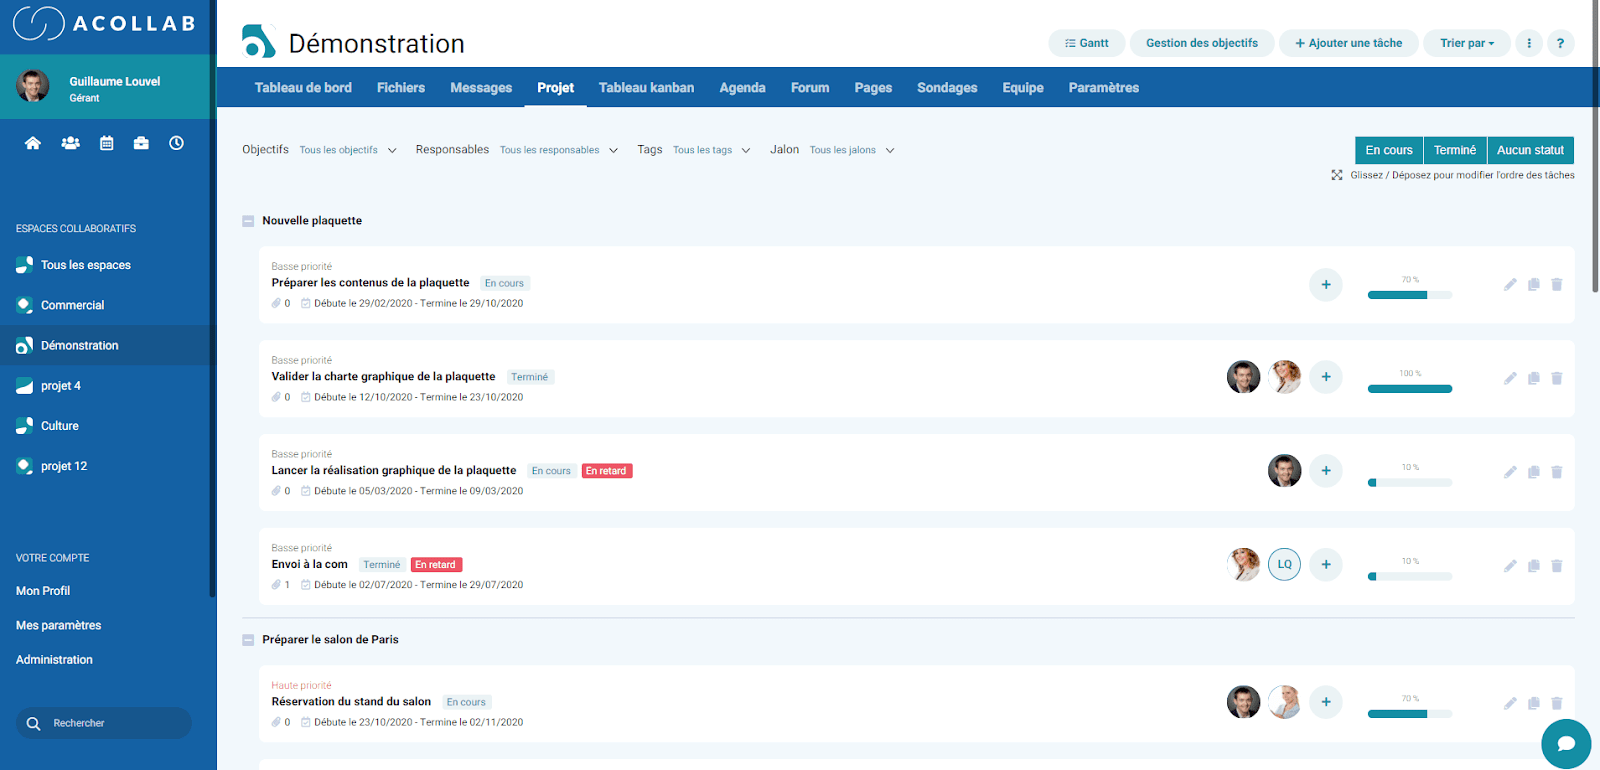 Acollab interface